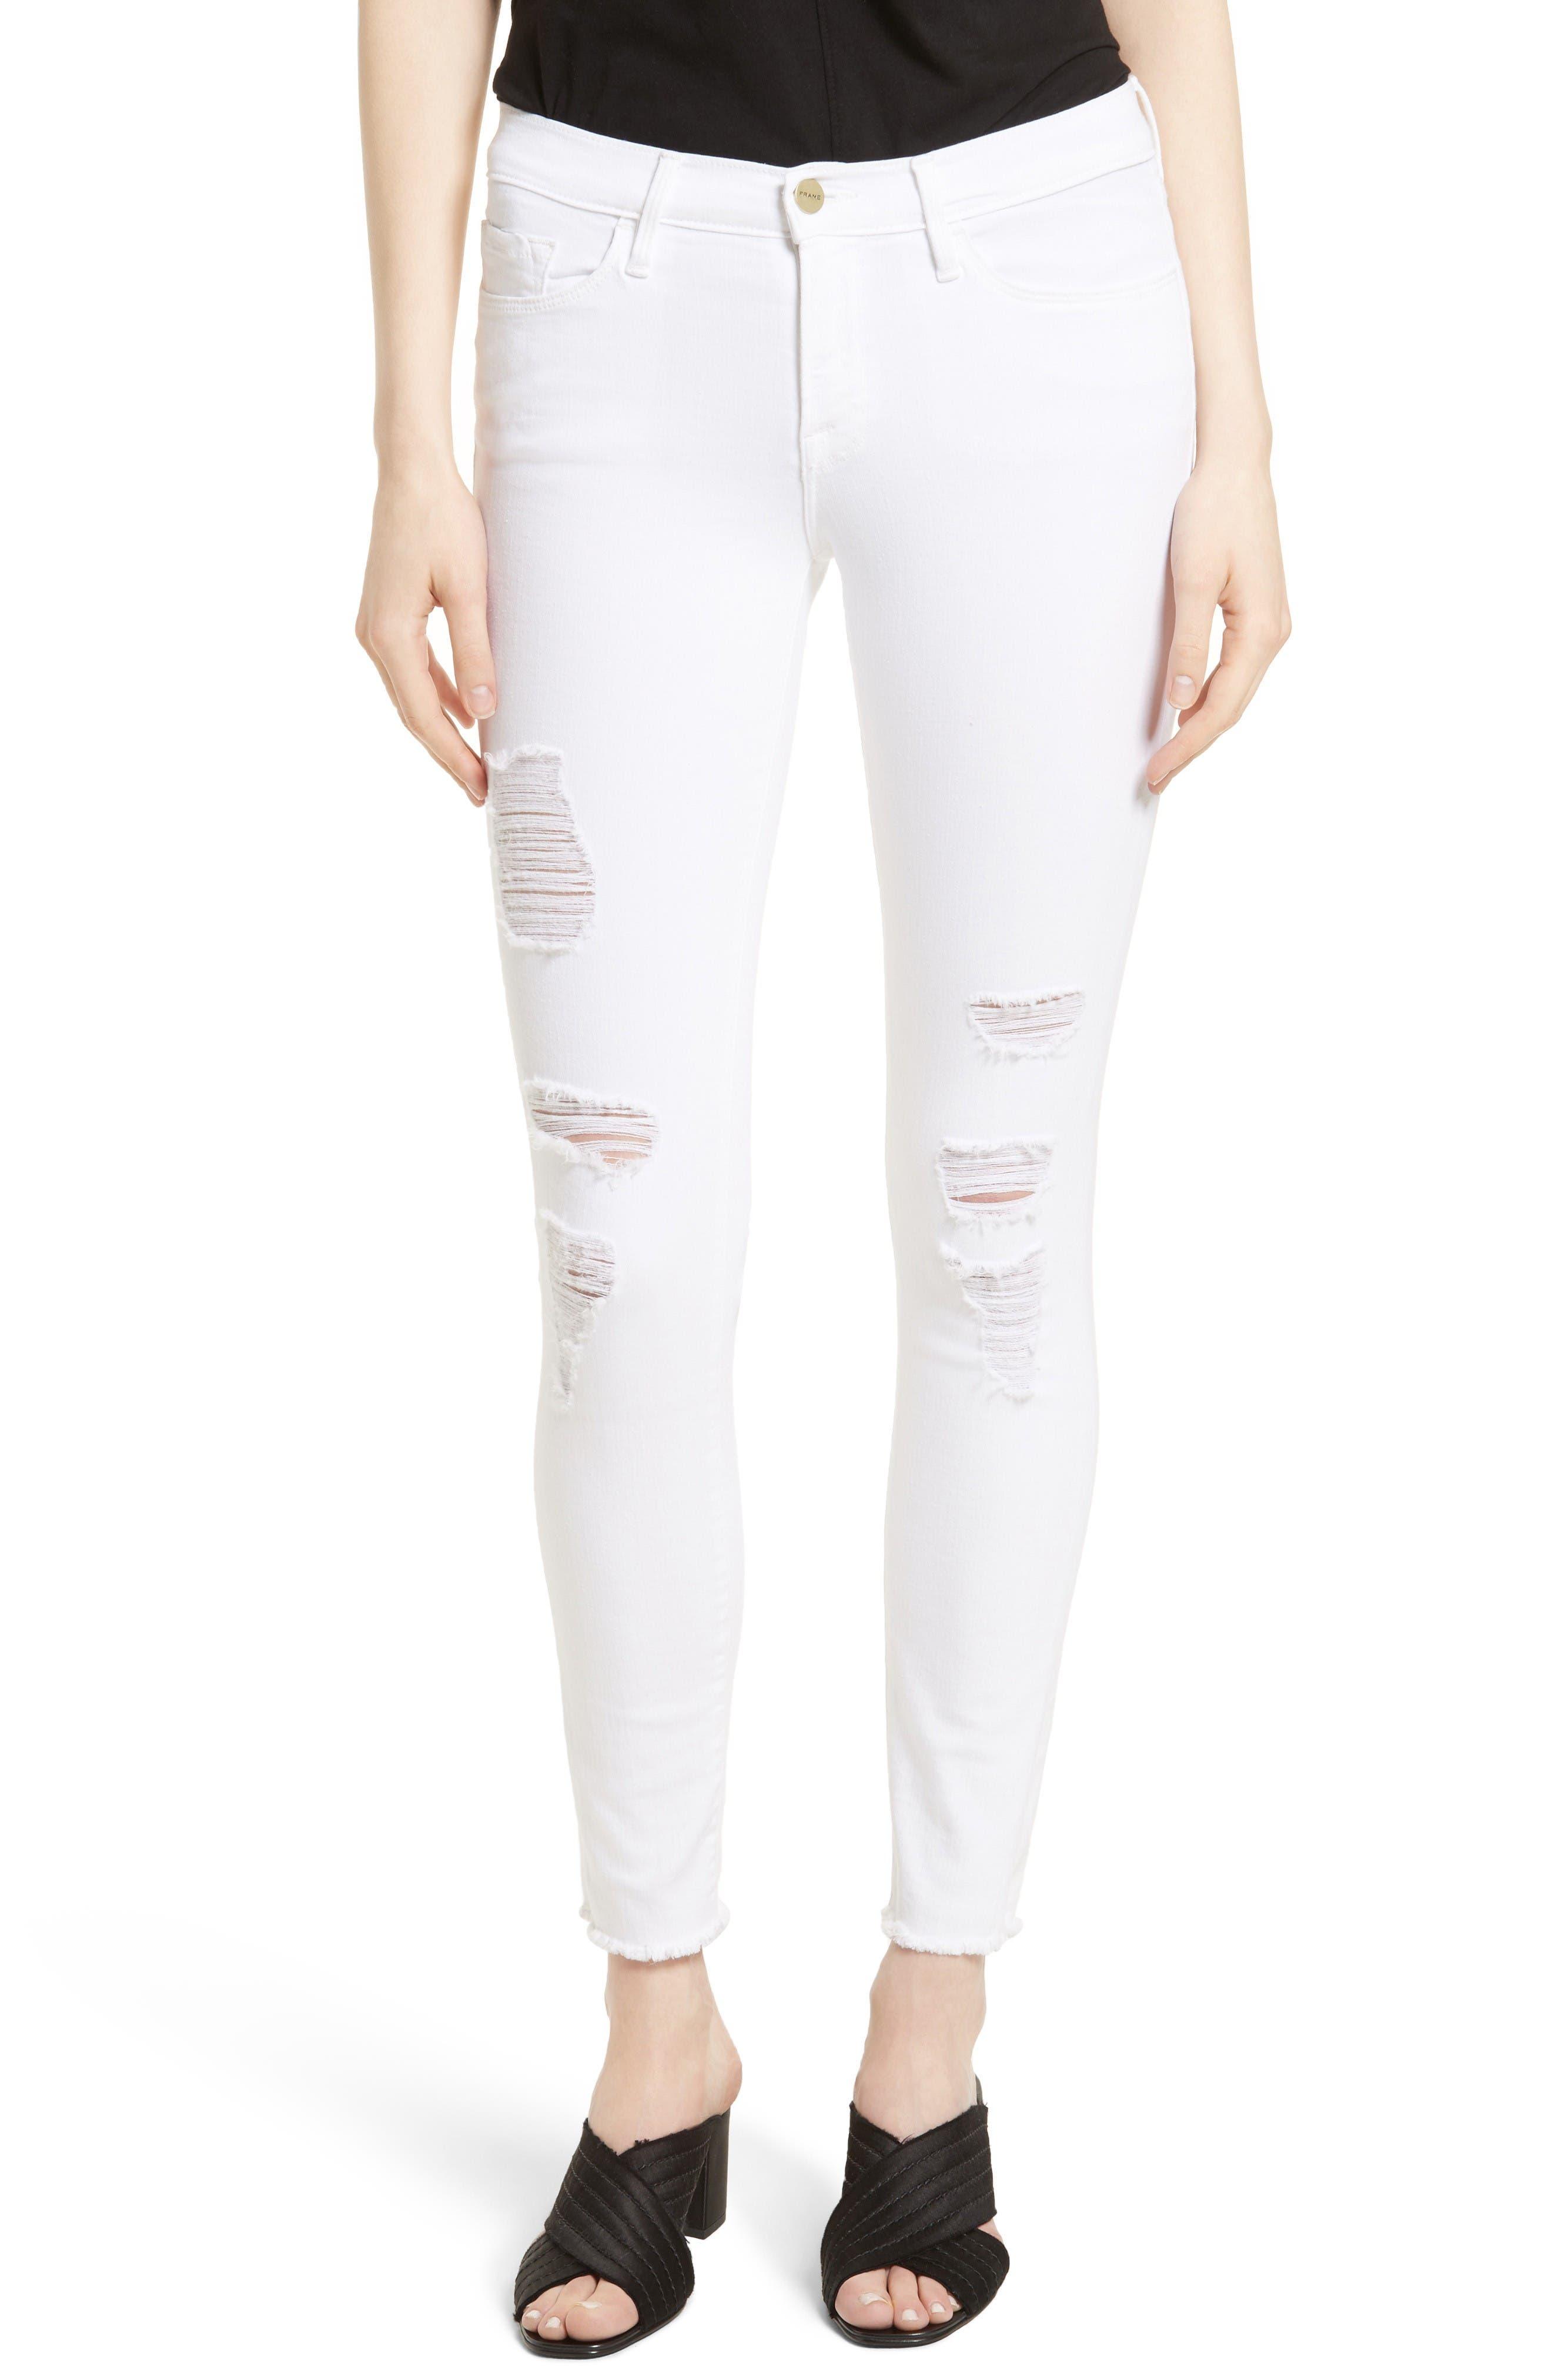 Main Image - FRAME 'Le Skinny de Jeanne' Ripped Jeans (Noir Jefferson) (Nordstrom Exclusive)